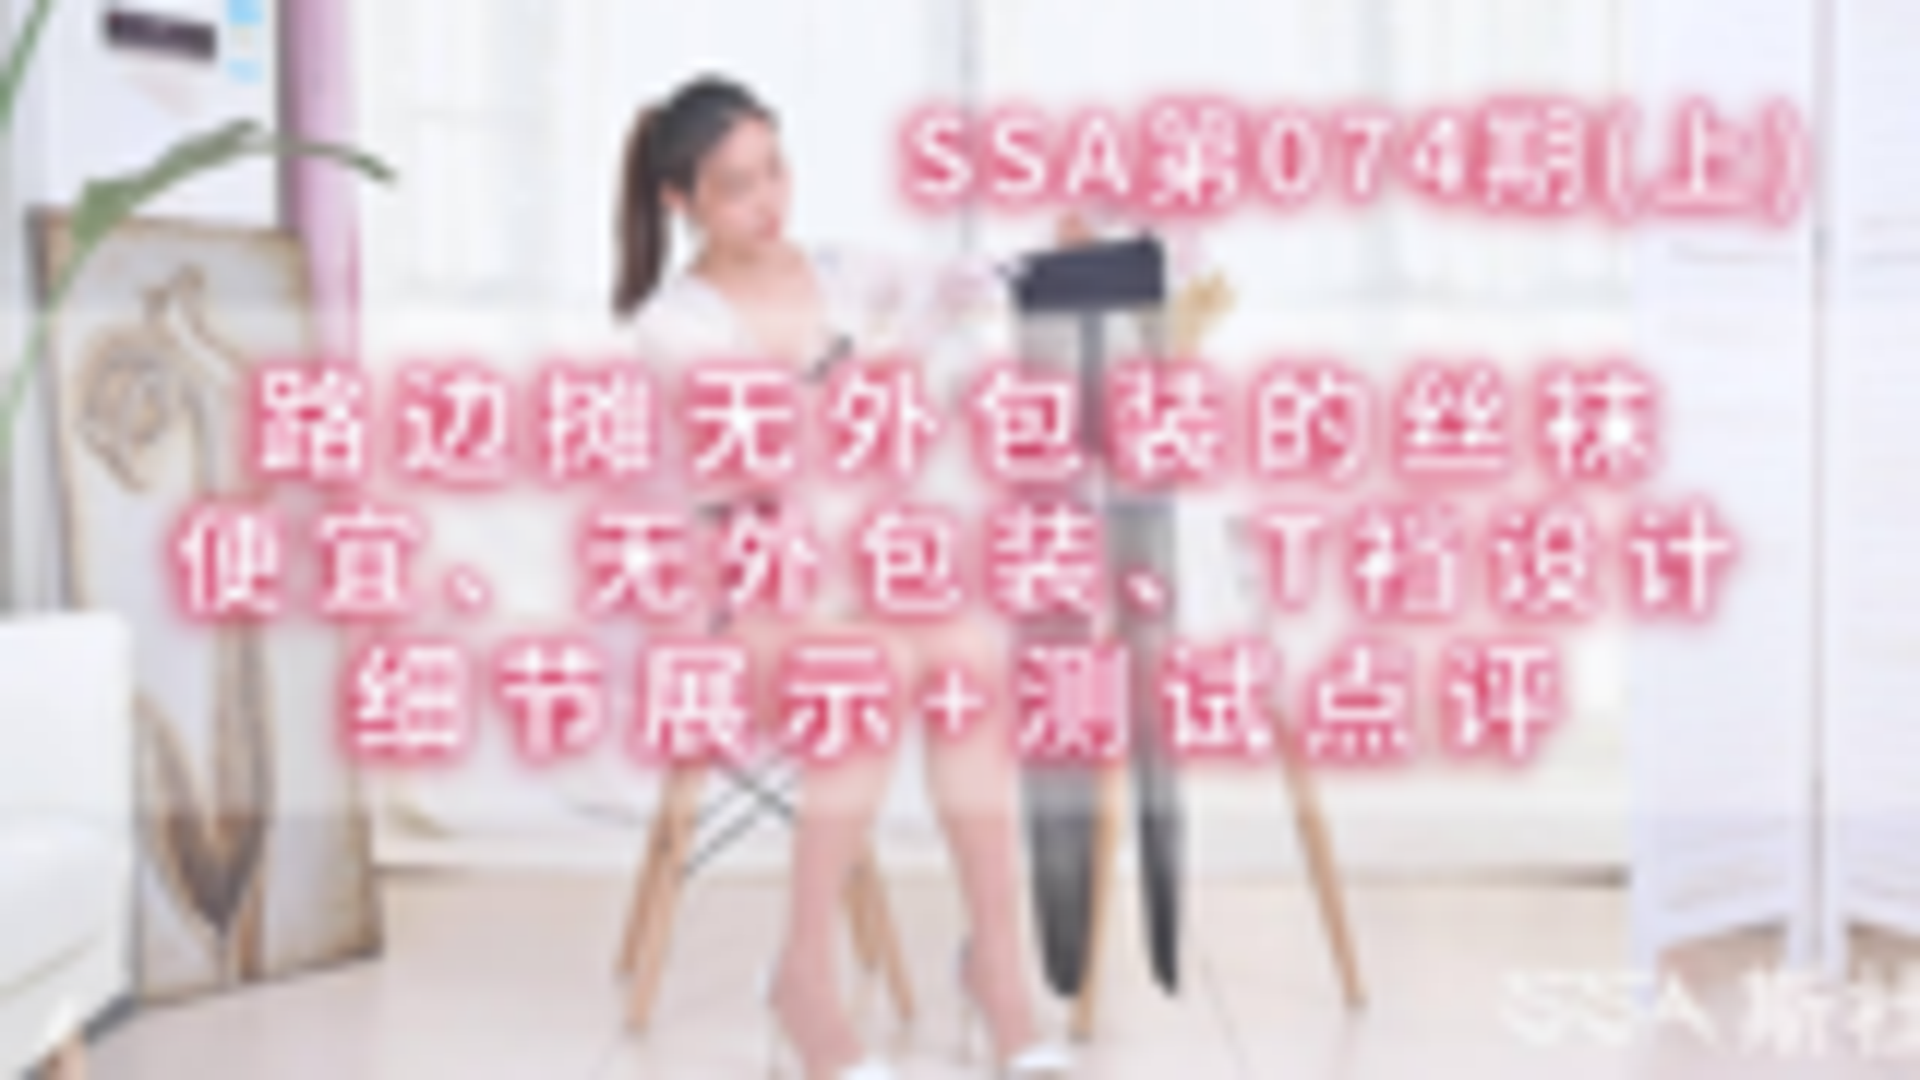 【SSA】你会买路边摊的无包装黑色连裤袜吗?(上)(74期删减版)